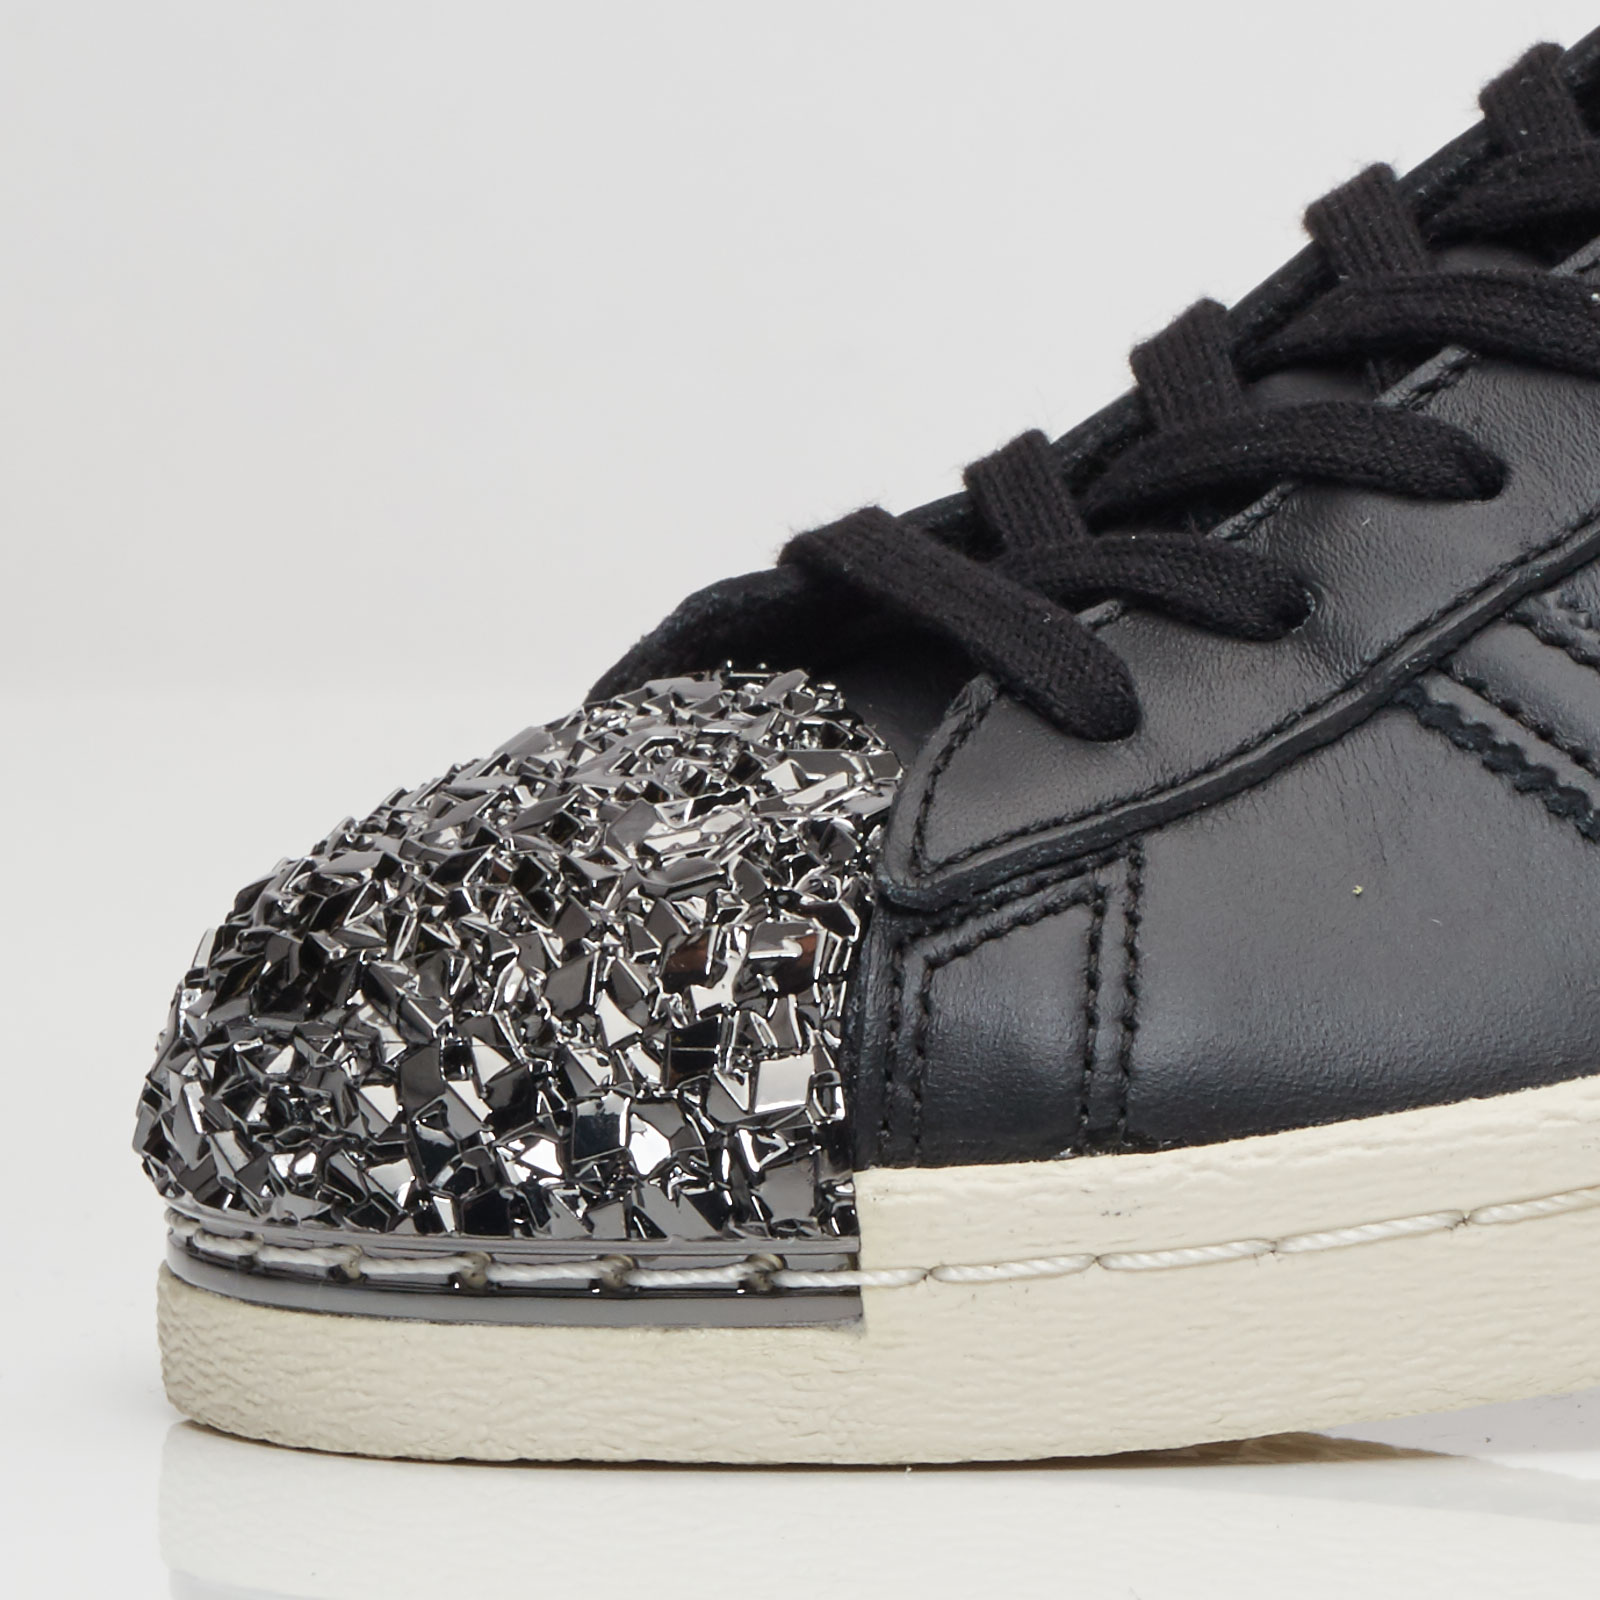 sports shoes 659d2 8c11b adidas Superstar 80s 3D MT W - Bb2033 - Sneakersnstuff ...